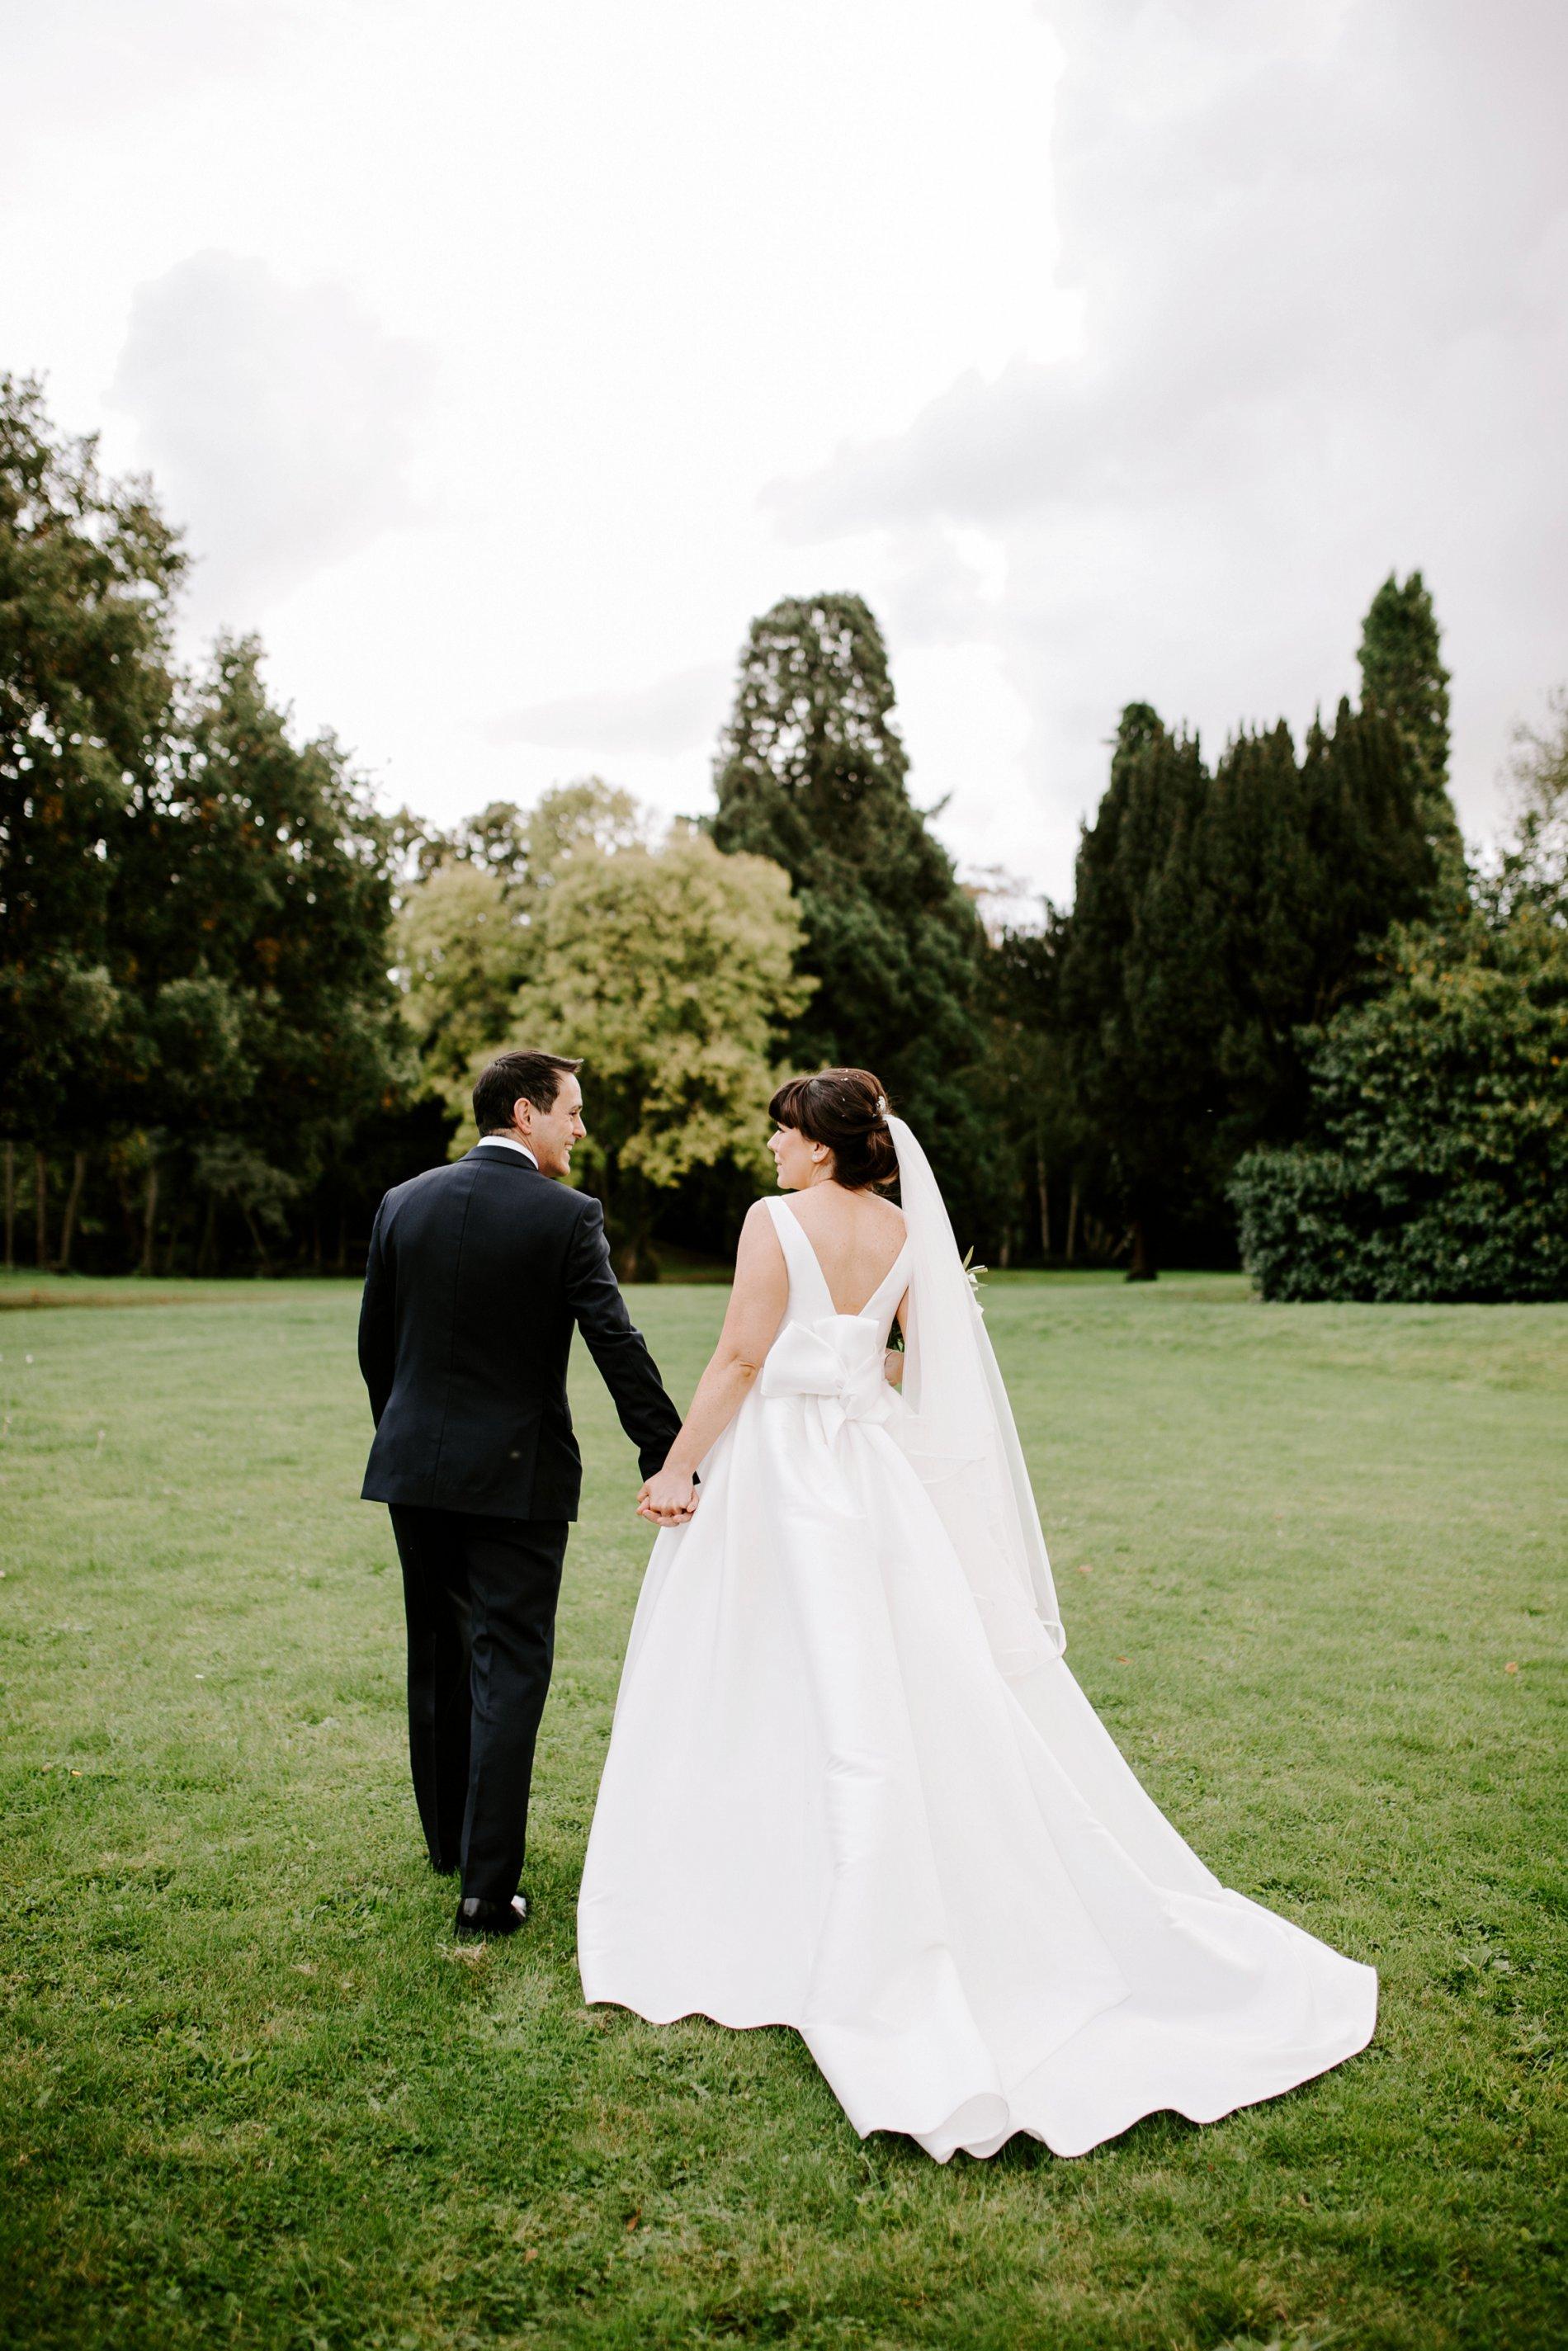 An Elegant White Wedding at Thicket Priory (c) Carla Whittingham Photography (55)